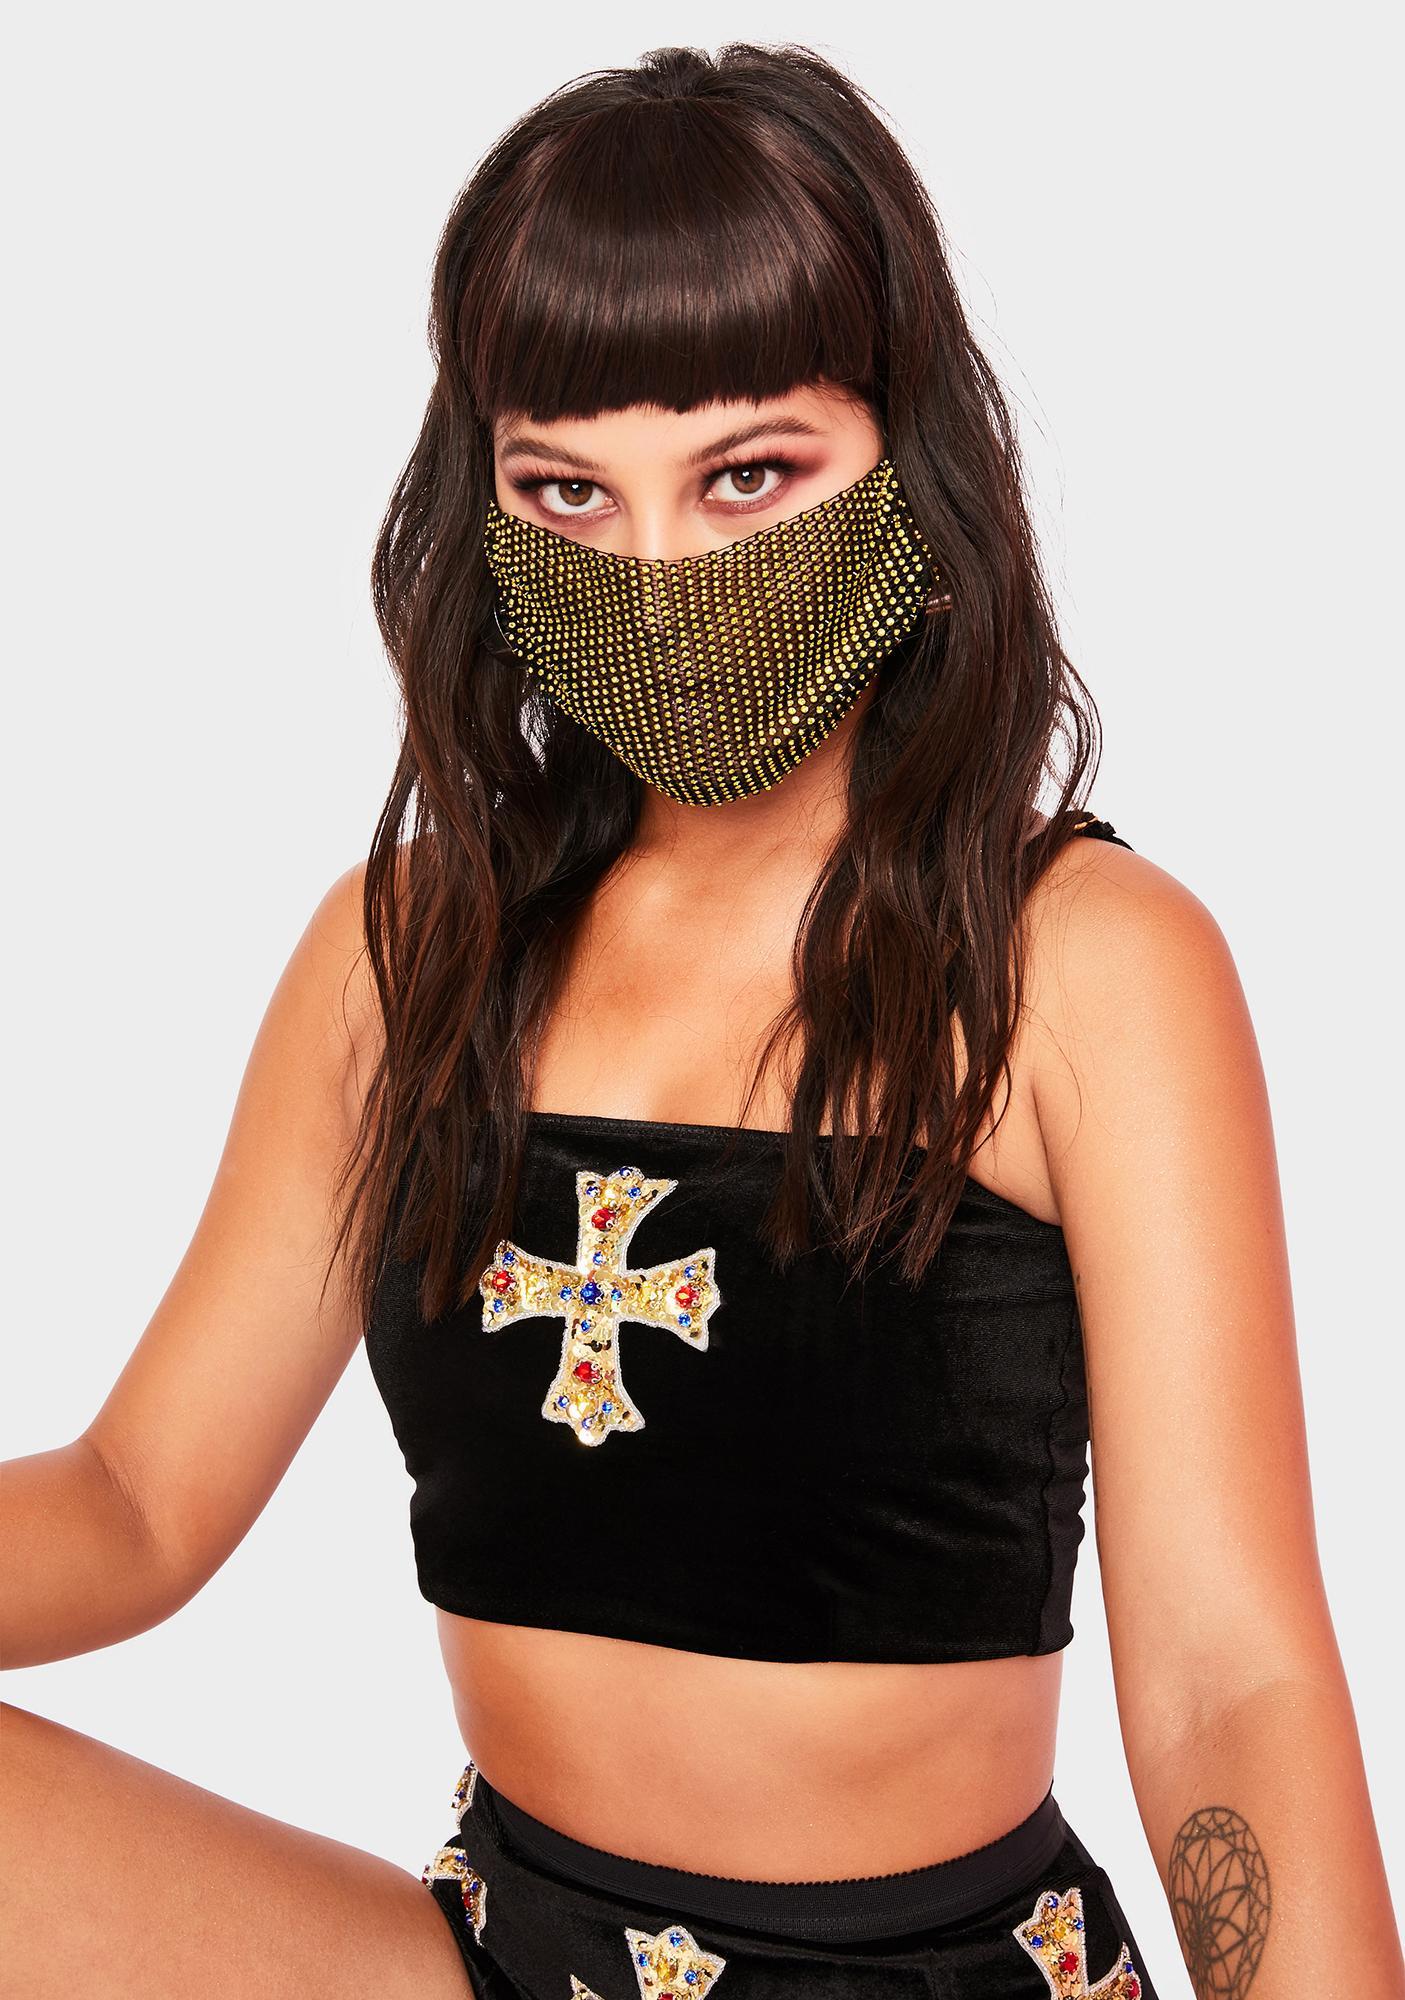 Gilded Keep It Classy Rhinestone Face Mask